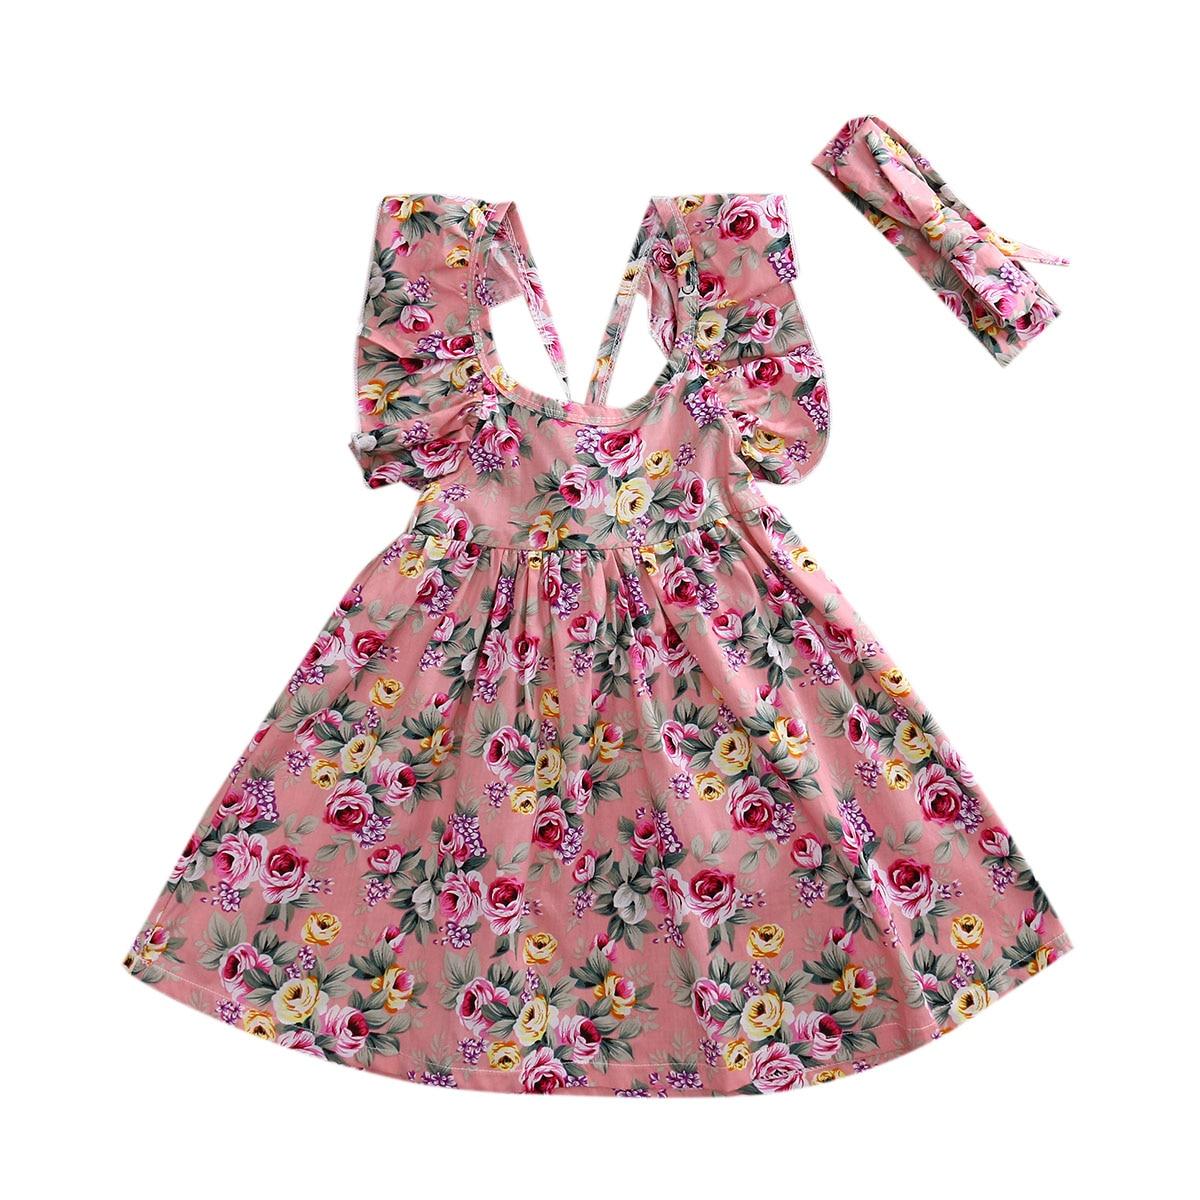 Kids Girls Toddler Baby Sleeveless Princess Dress Flower Tutu Dresses 2pcs Set kid girl print dress